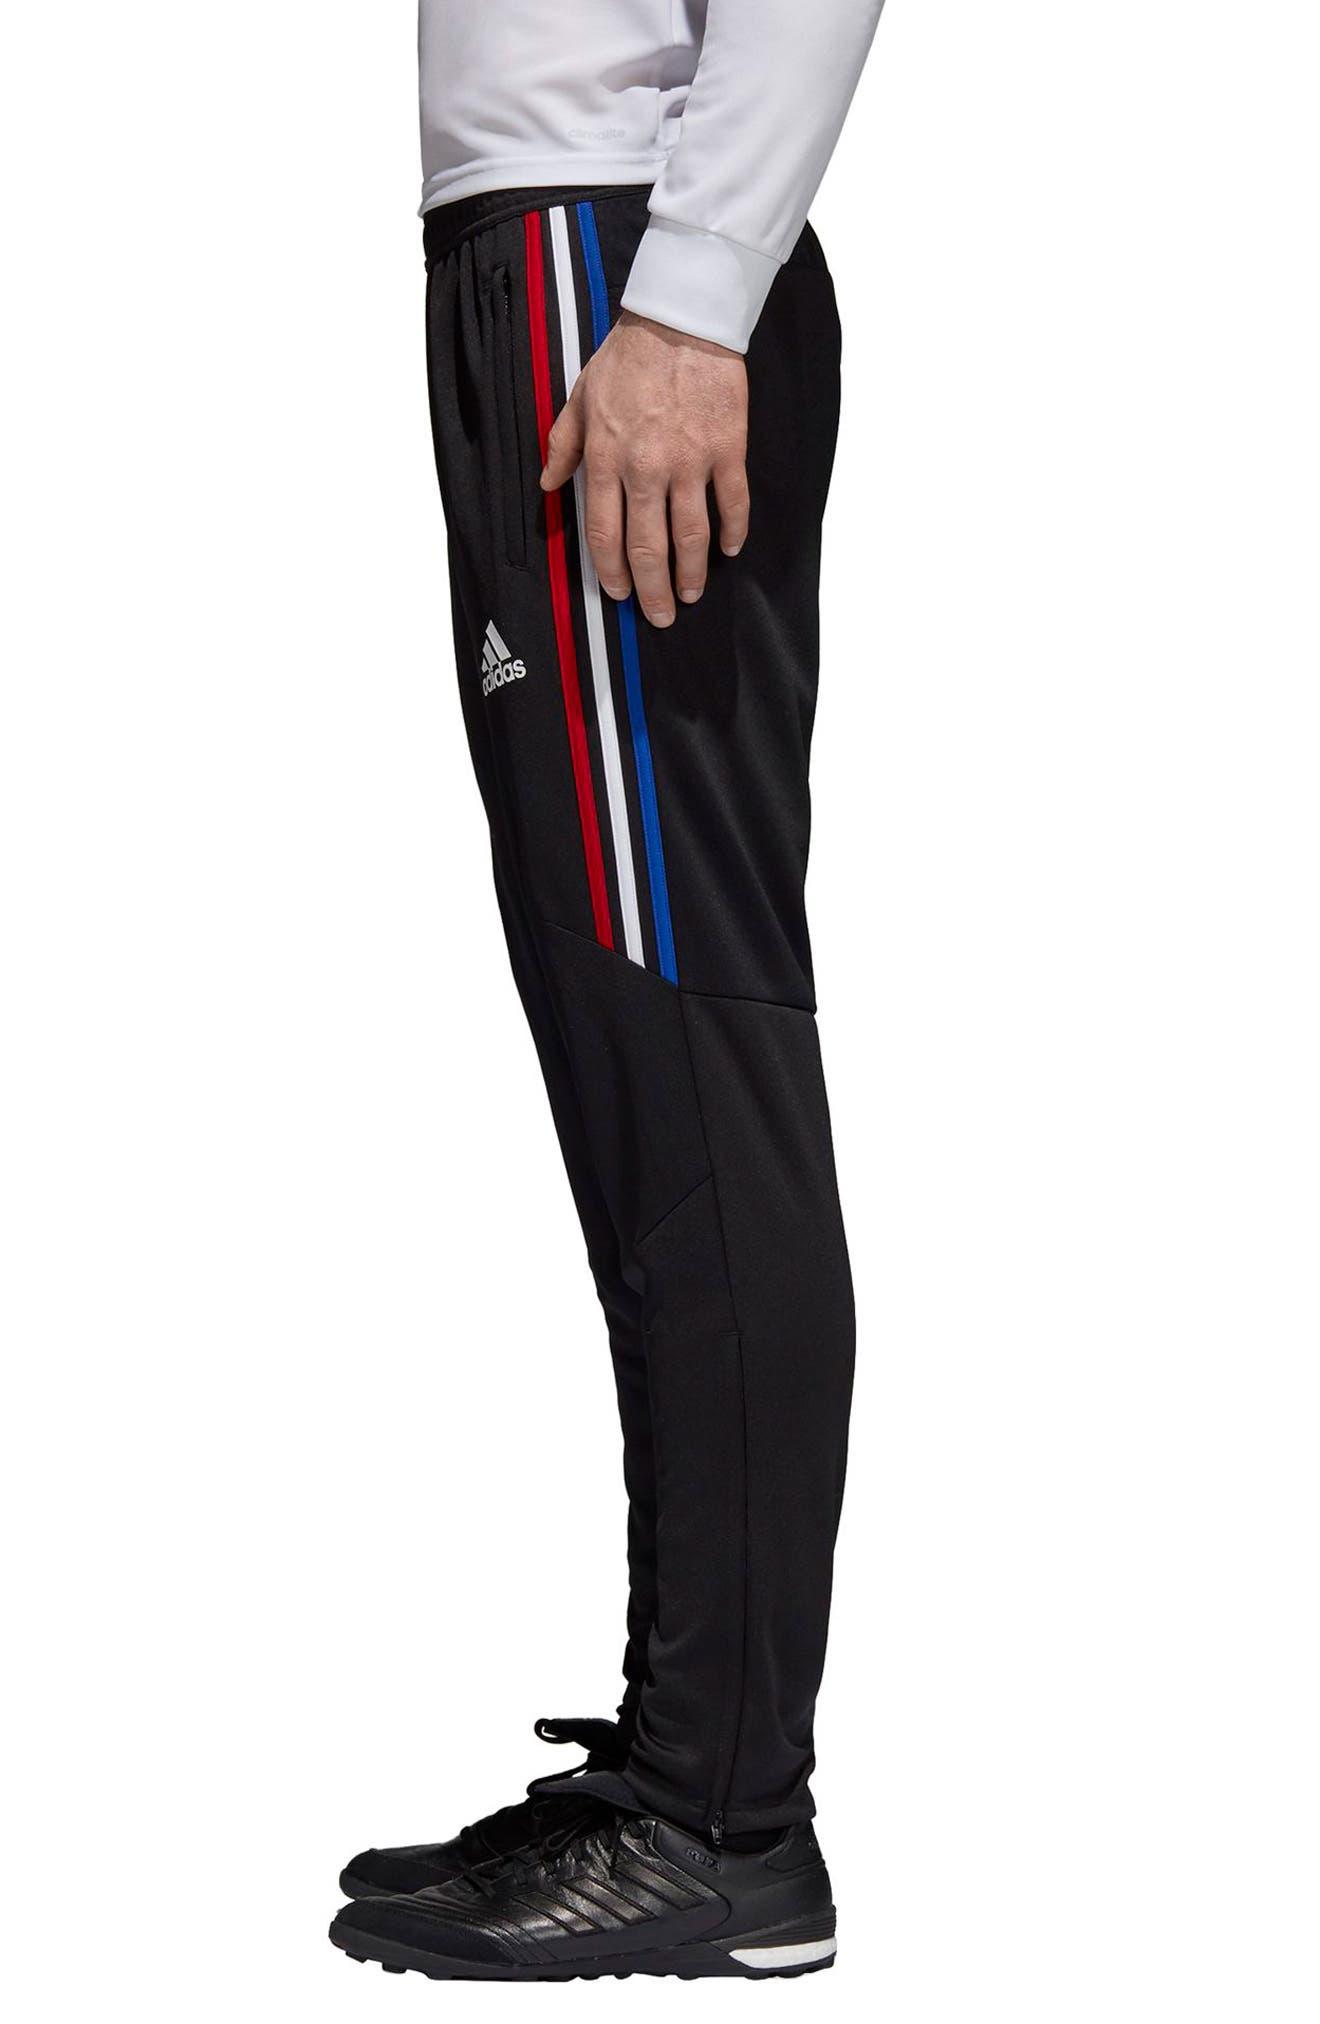 ,                             Tiro 17 Regular Fit Training Pants,                             Alternate thumbnail 4, color,                             BLACK/ RED/ WHITE/ BLUE